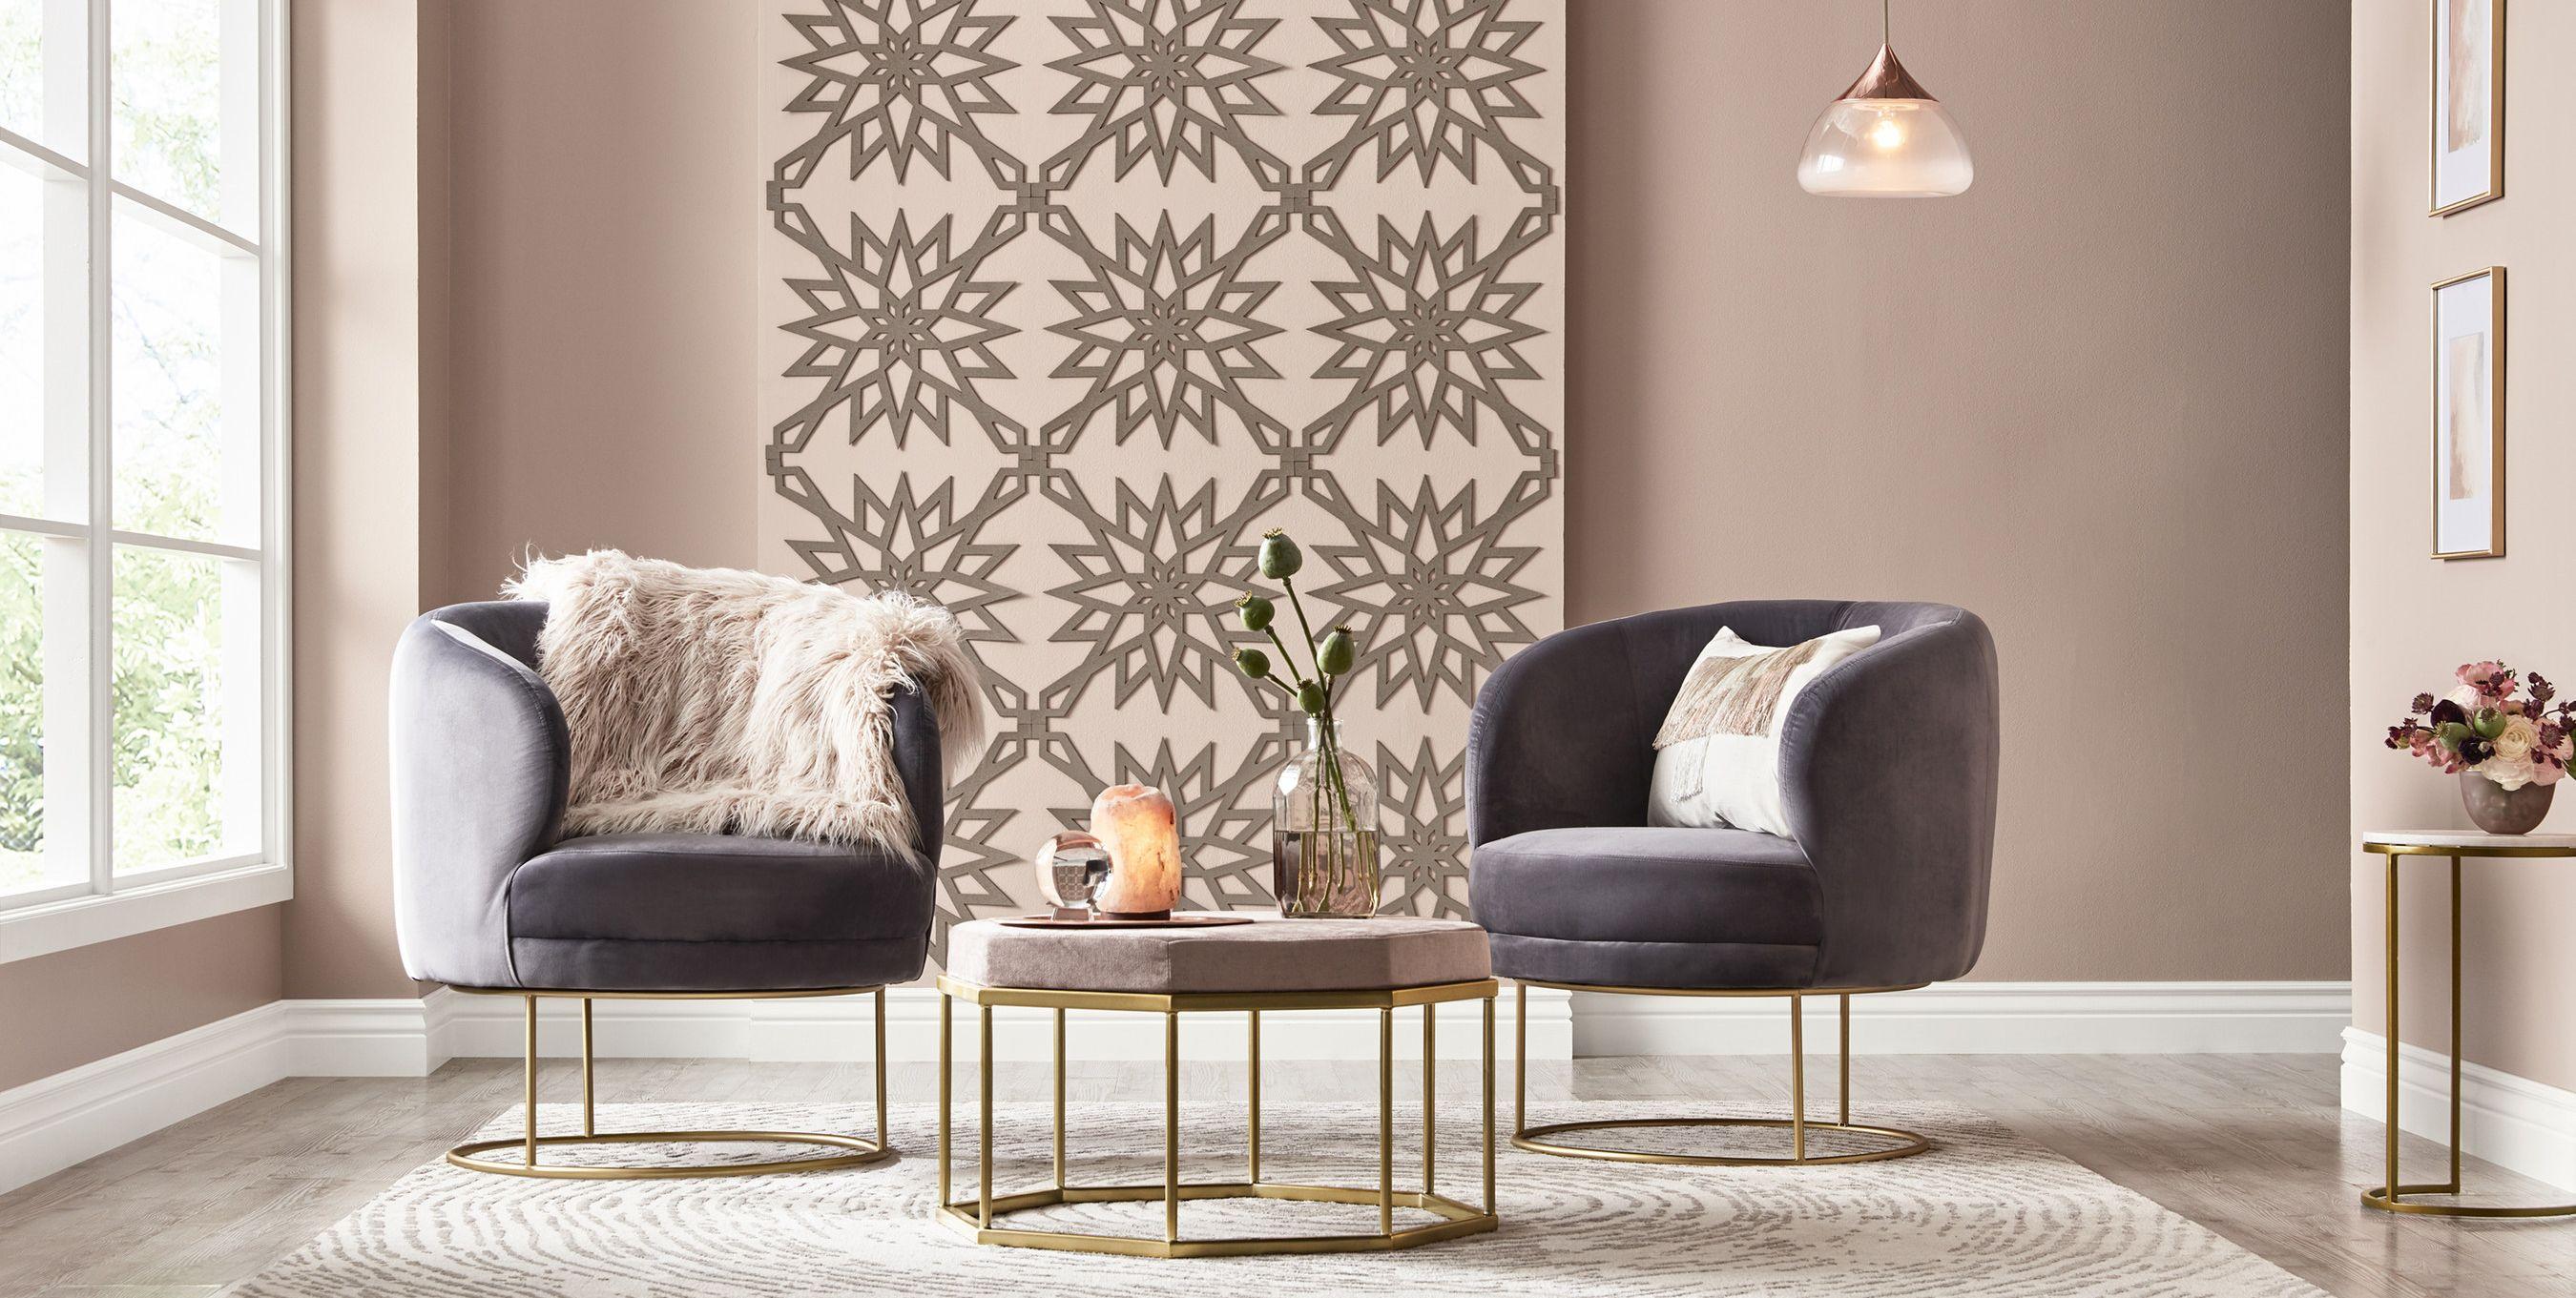 10 Best Interior Paint Brands 2019